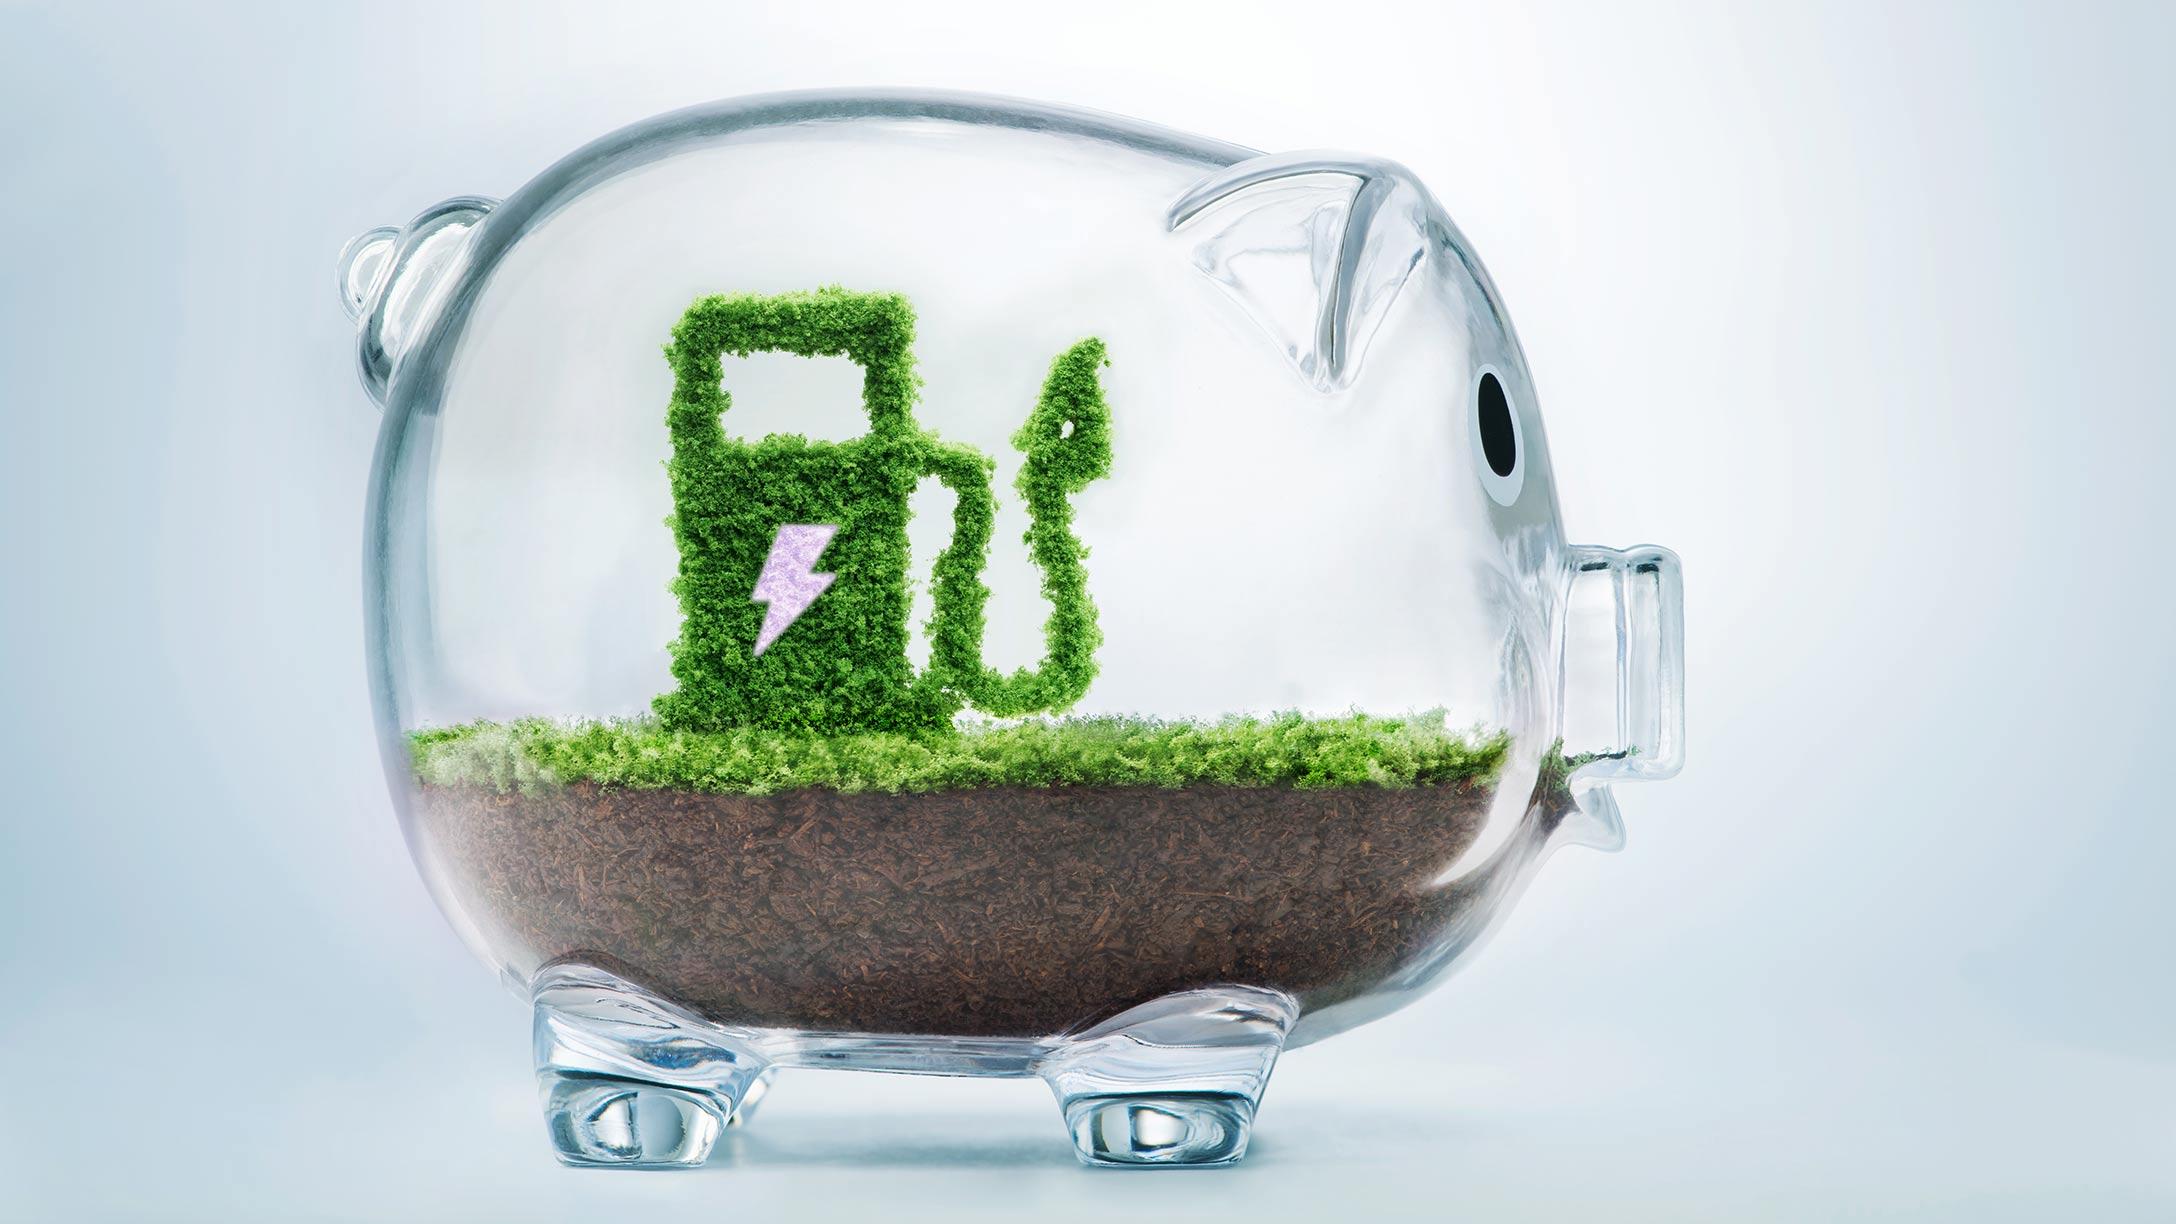 ev-green-charging